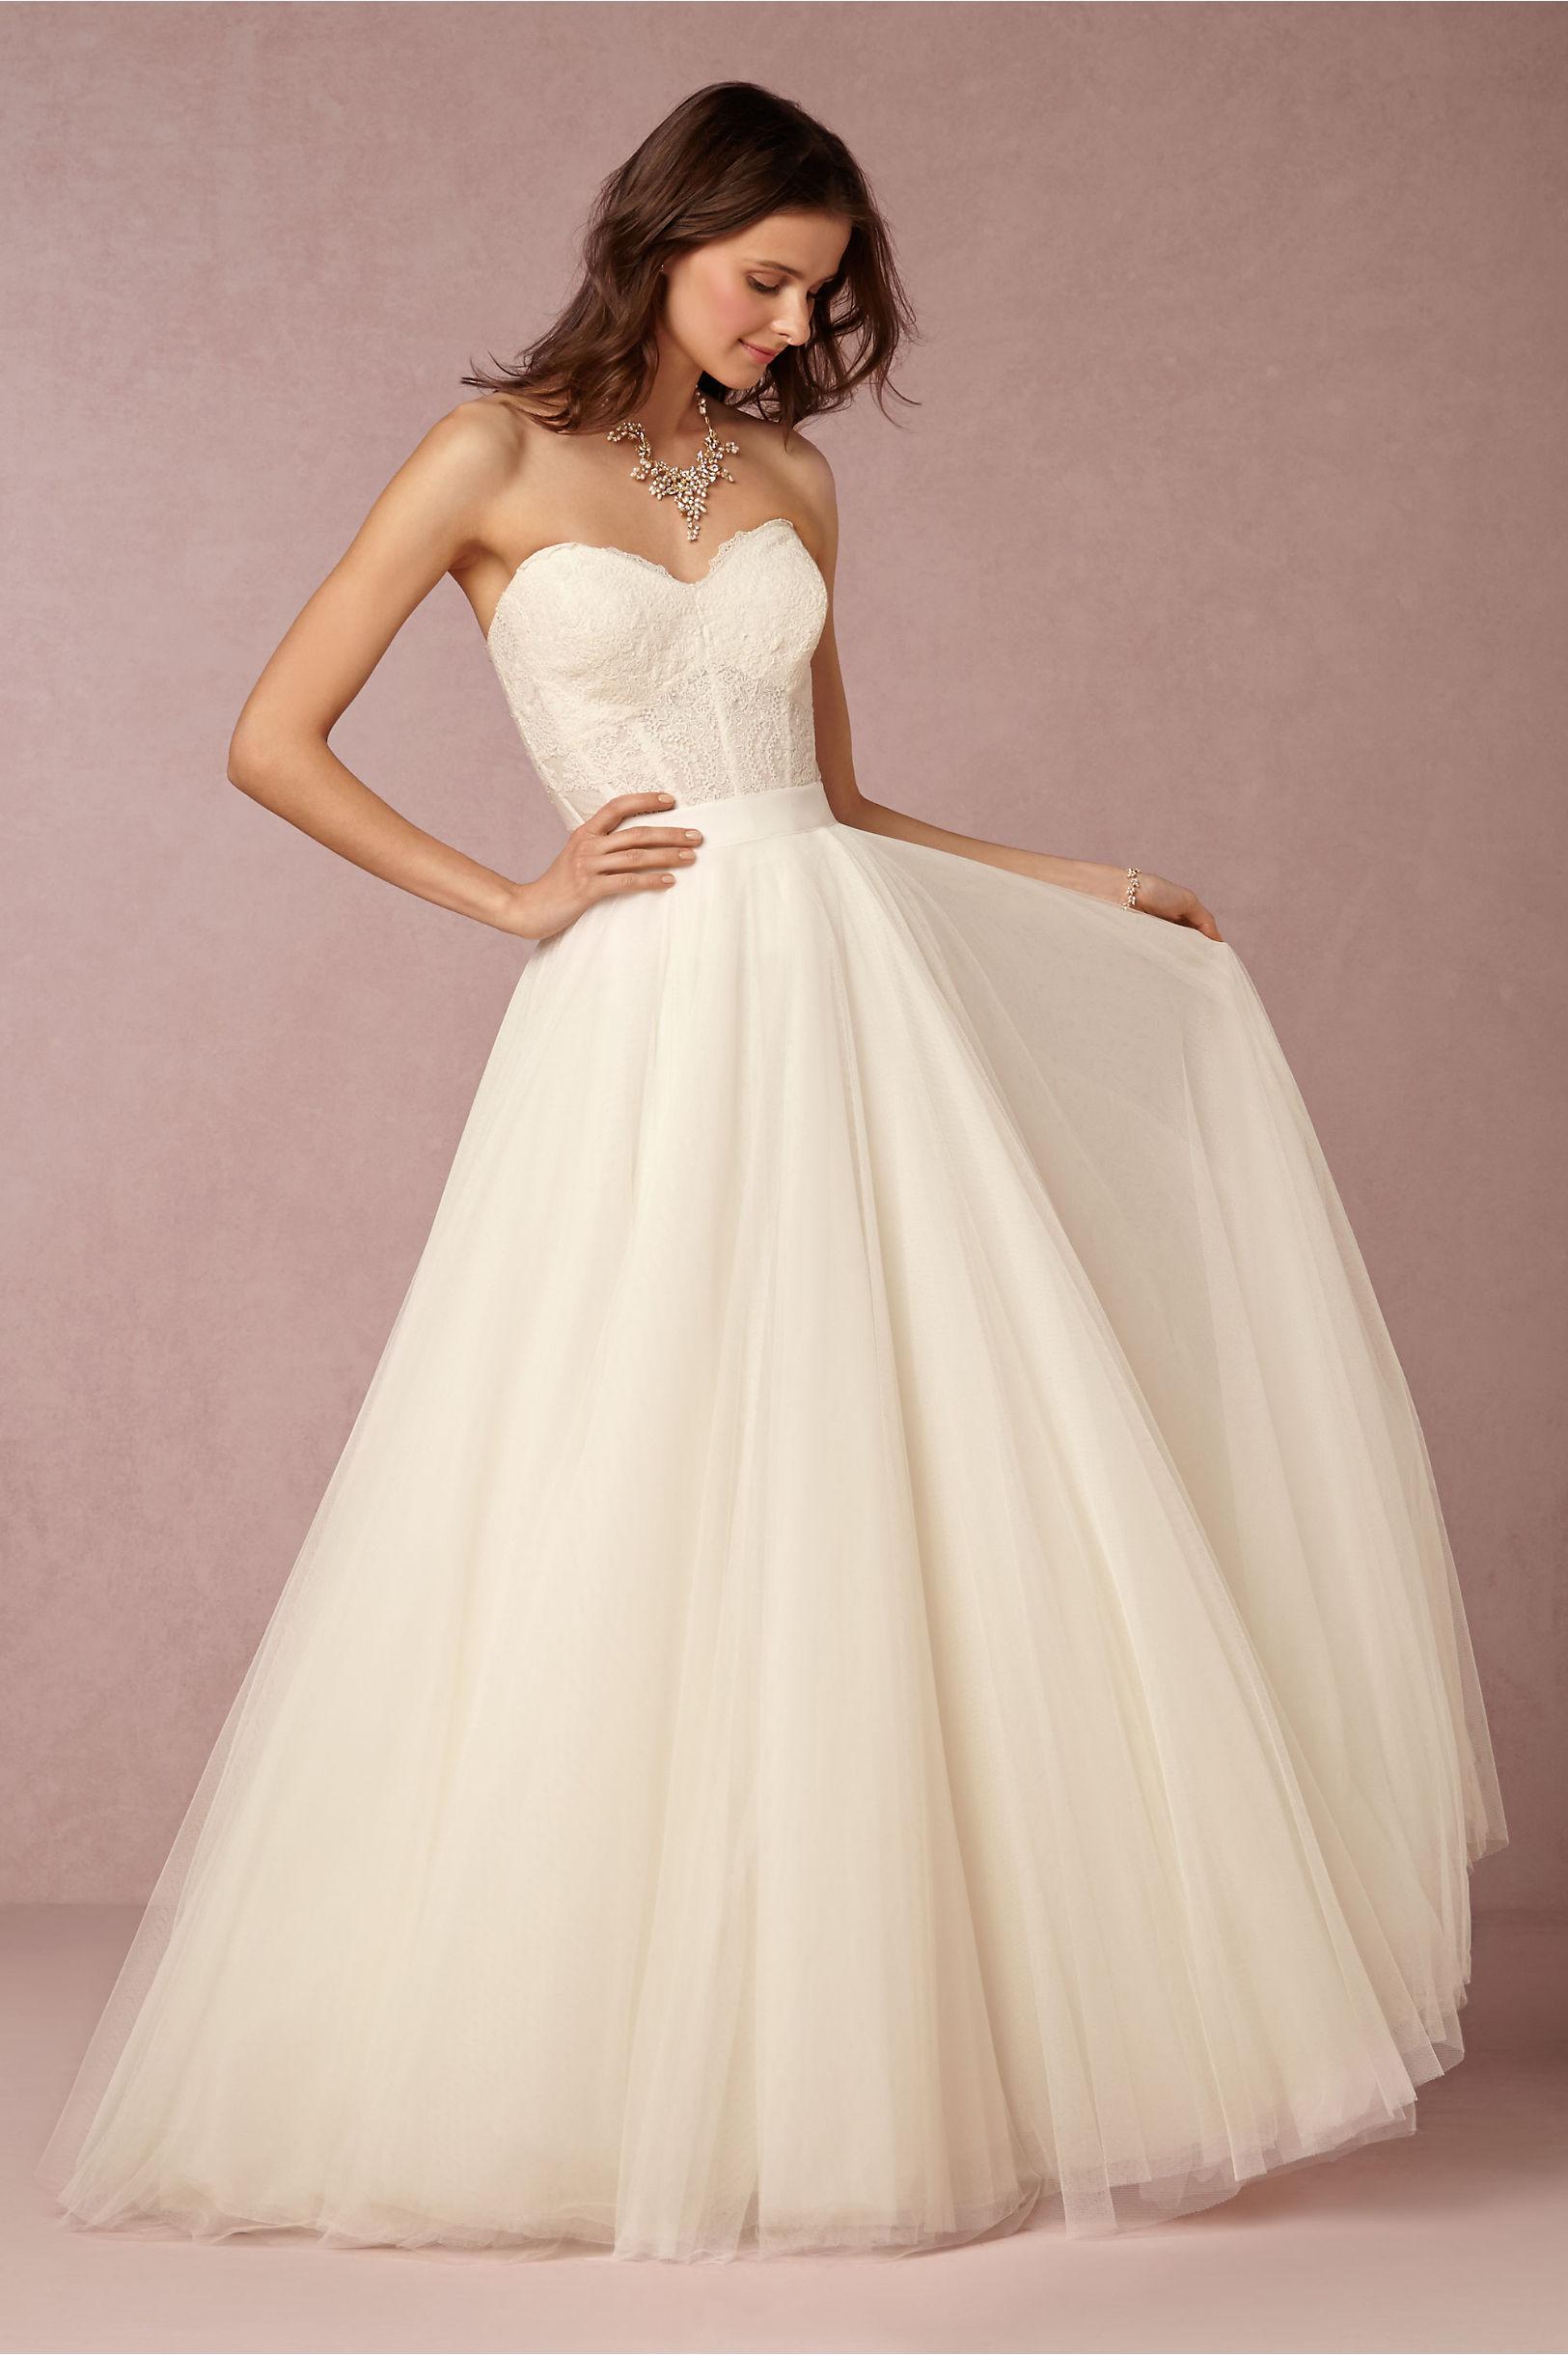 Carina Corset & Ahsan Skirt in Bride | BHLDN